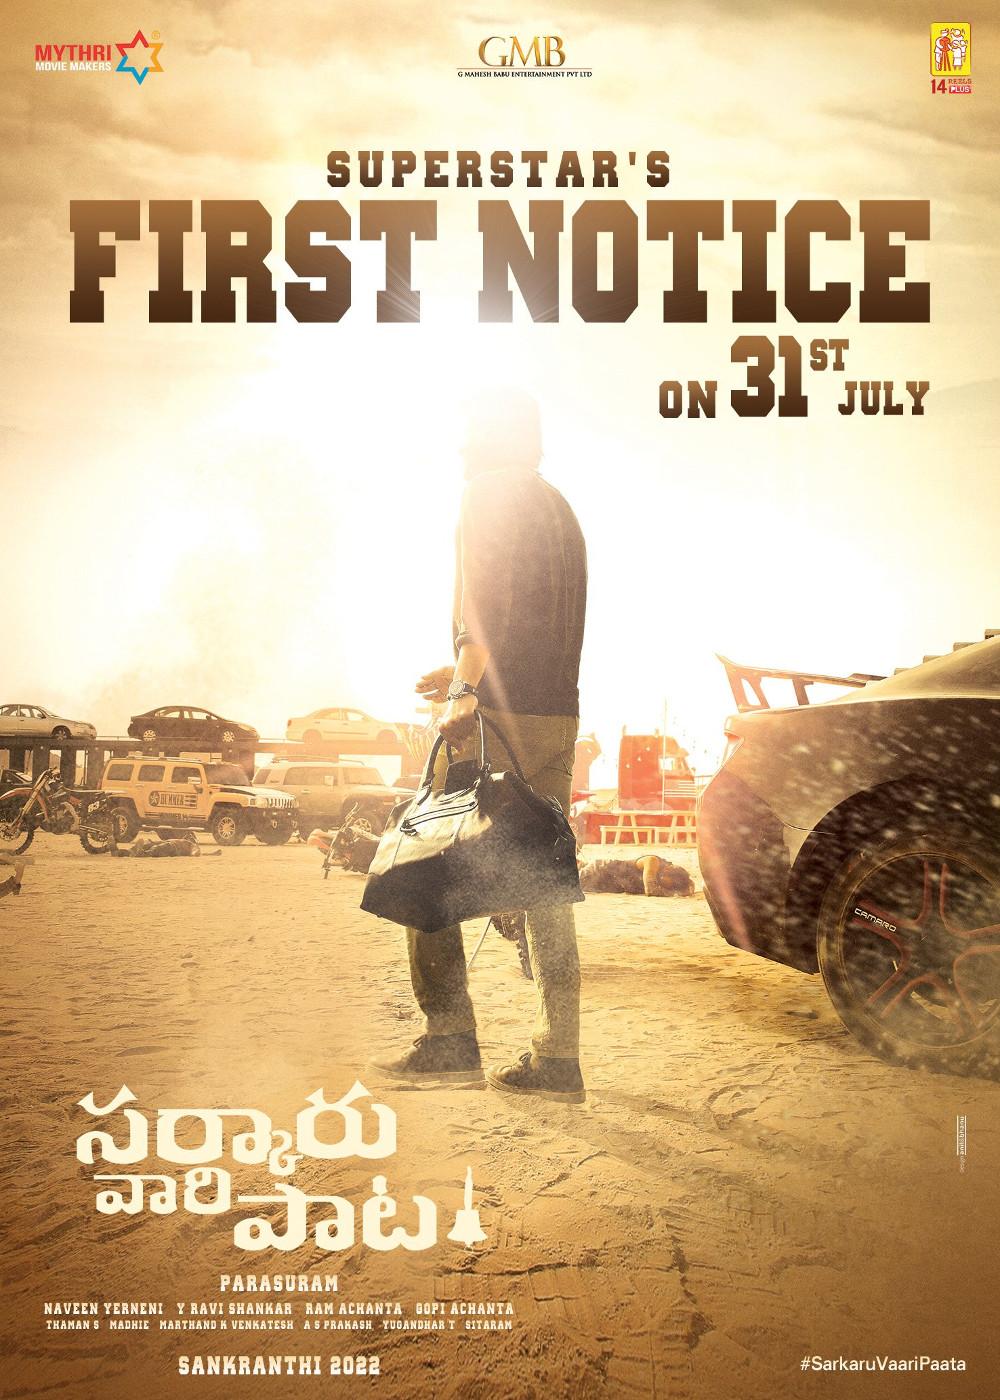 Mahesh Babu Sarkaru Vaari Paata First Notice On July 31st